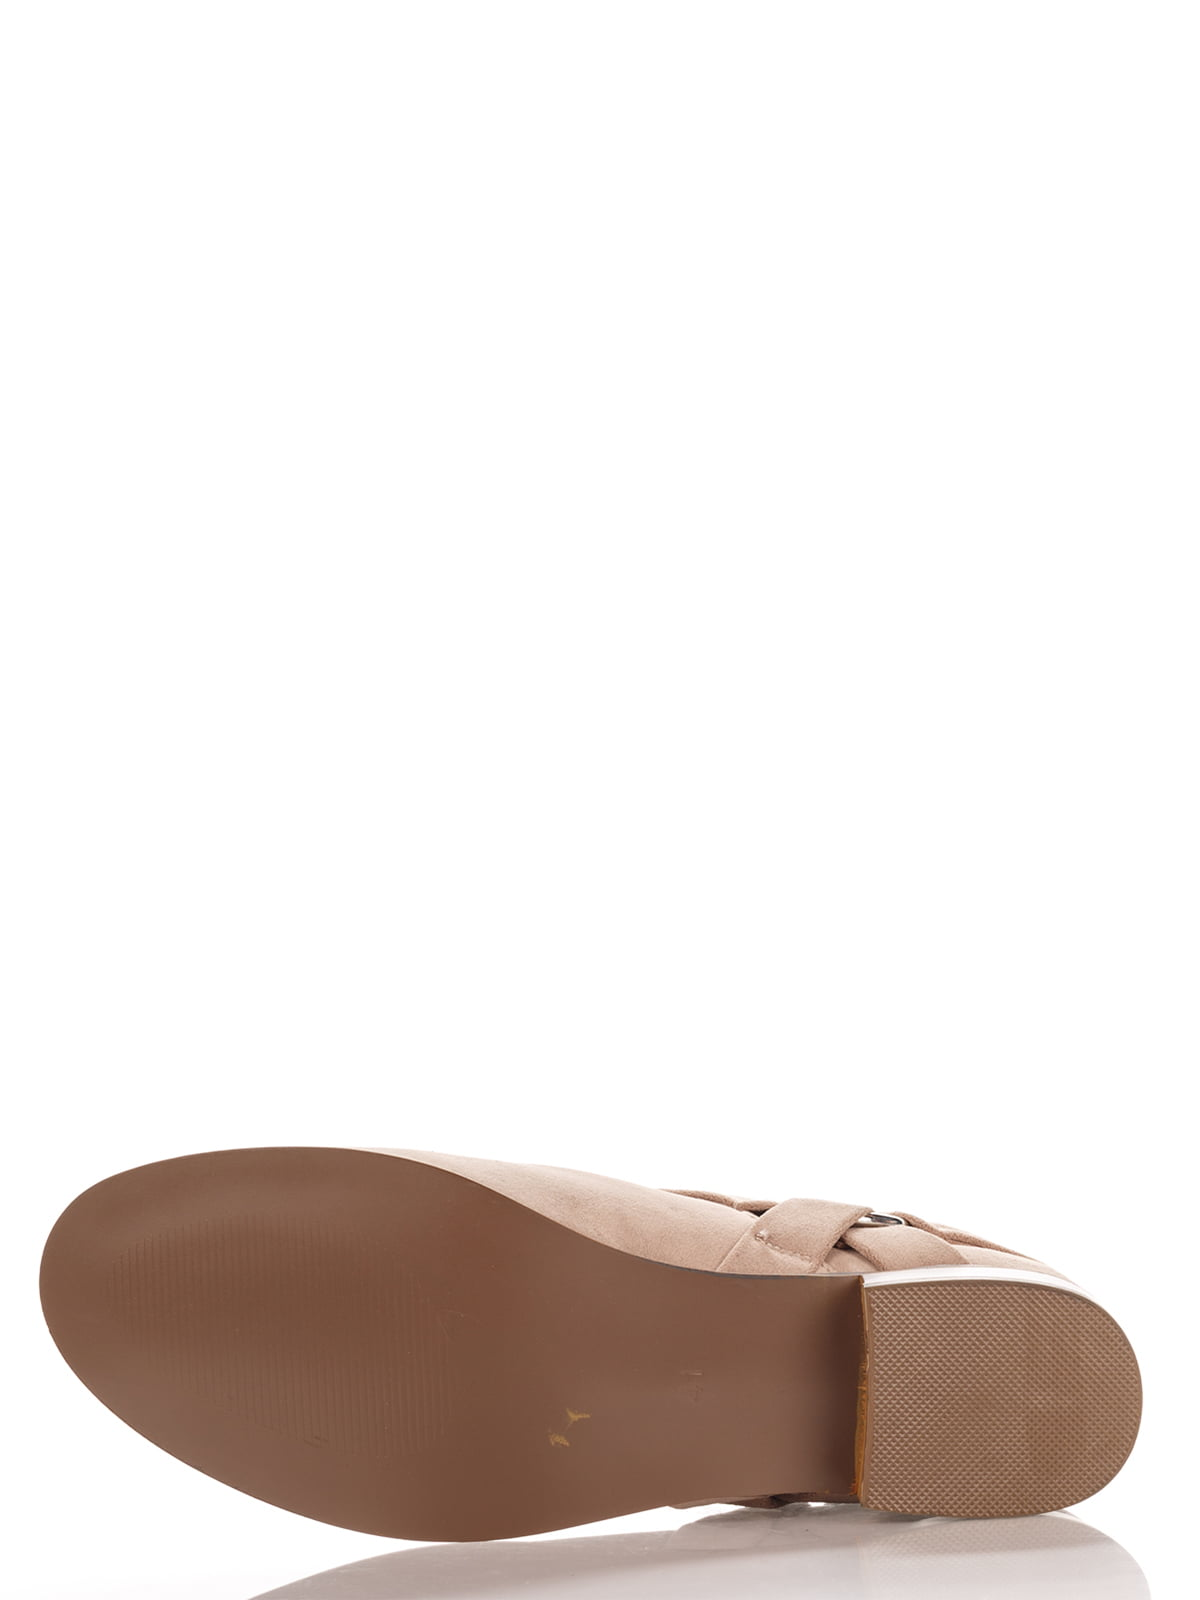 Ботинки бежевые | 4123509 | фото 4